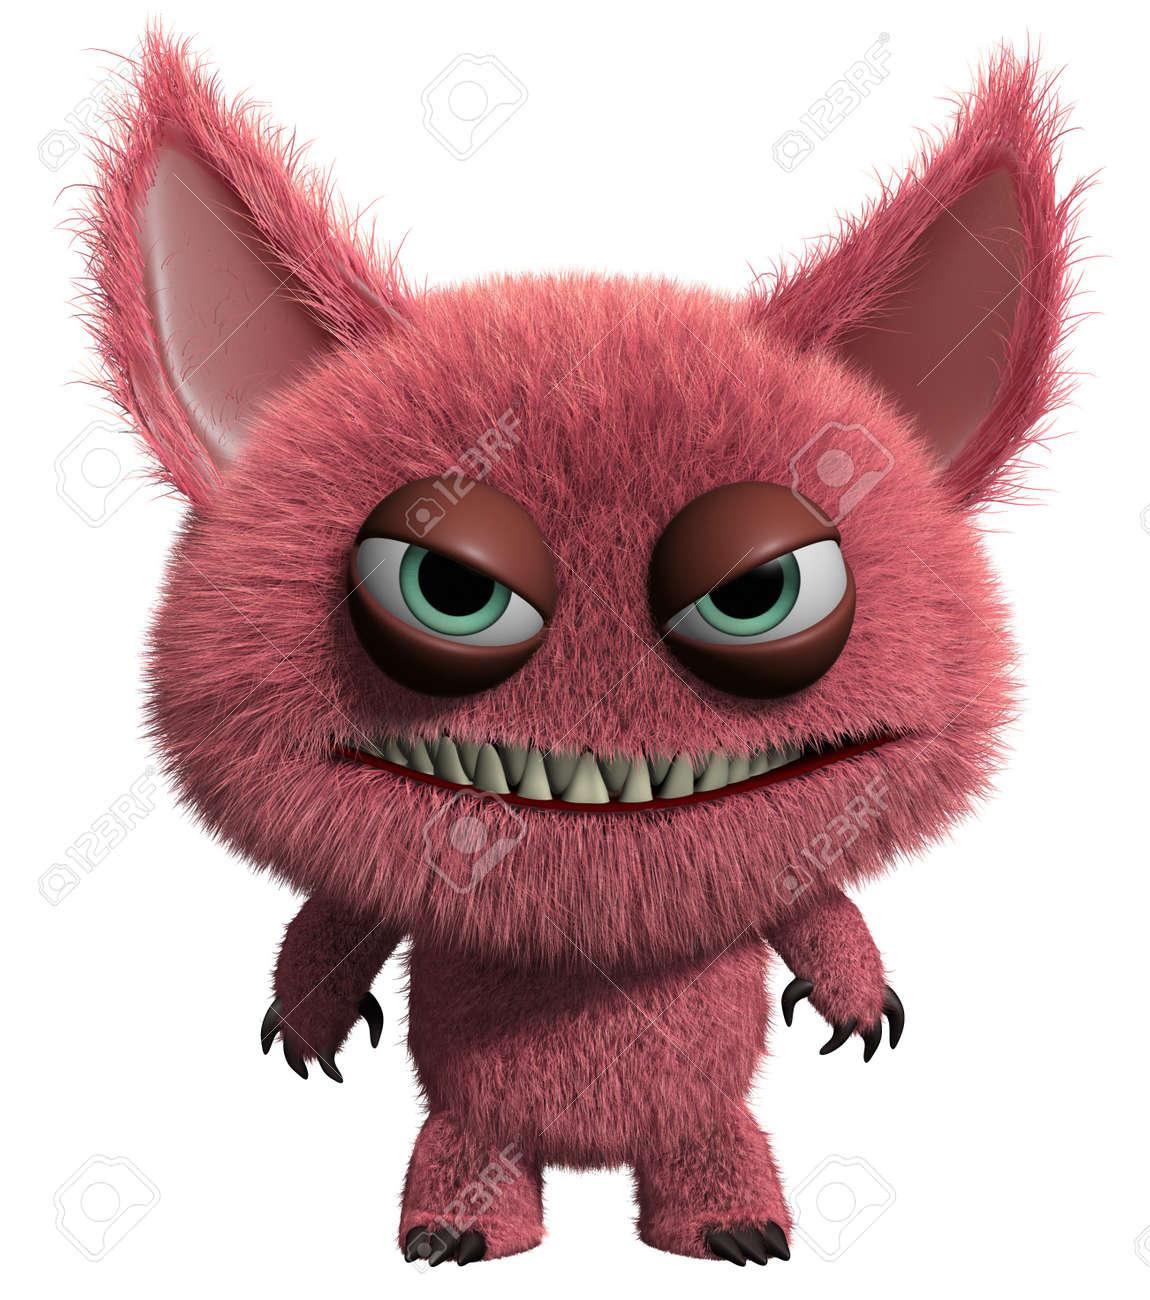 3d cartoon cute furry gremlin monster Stock Photo - 15743619